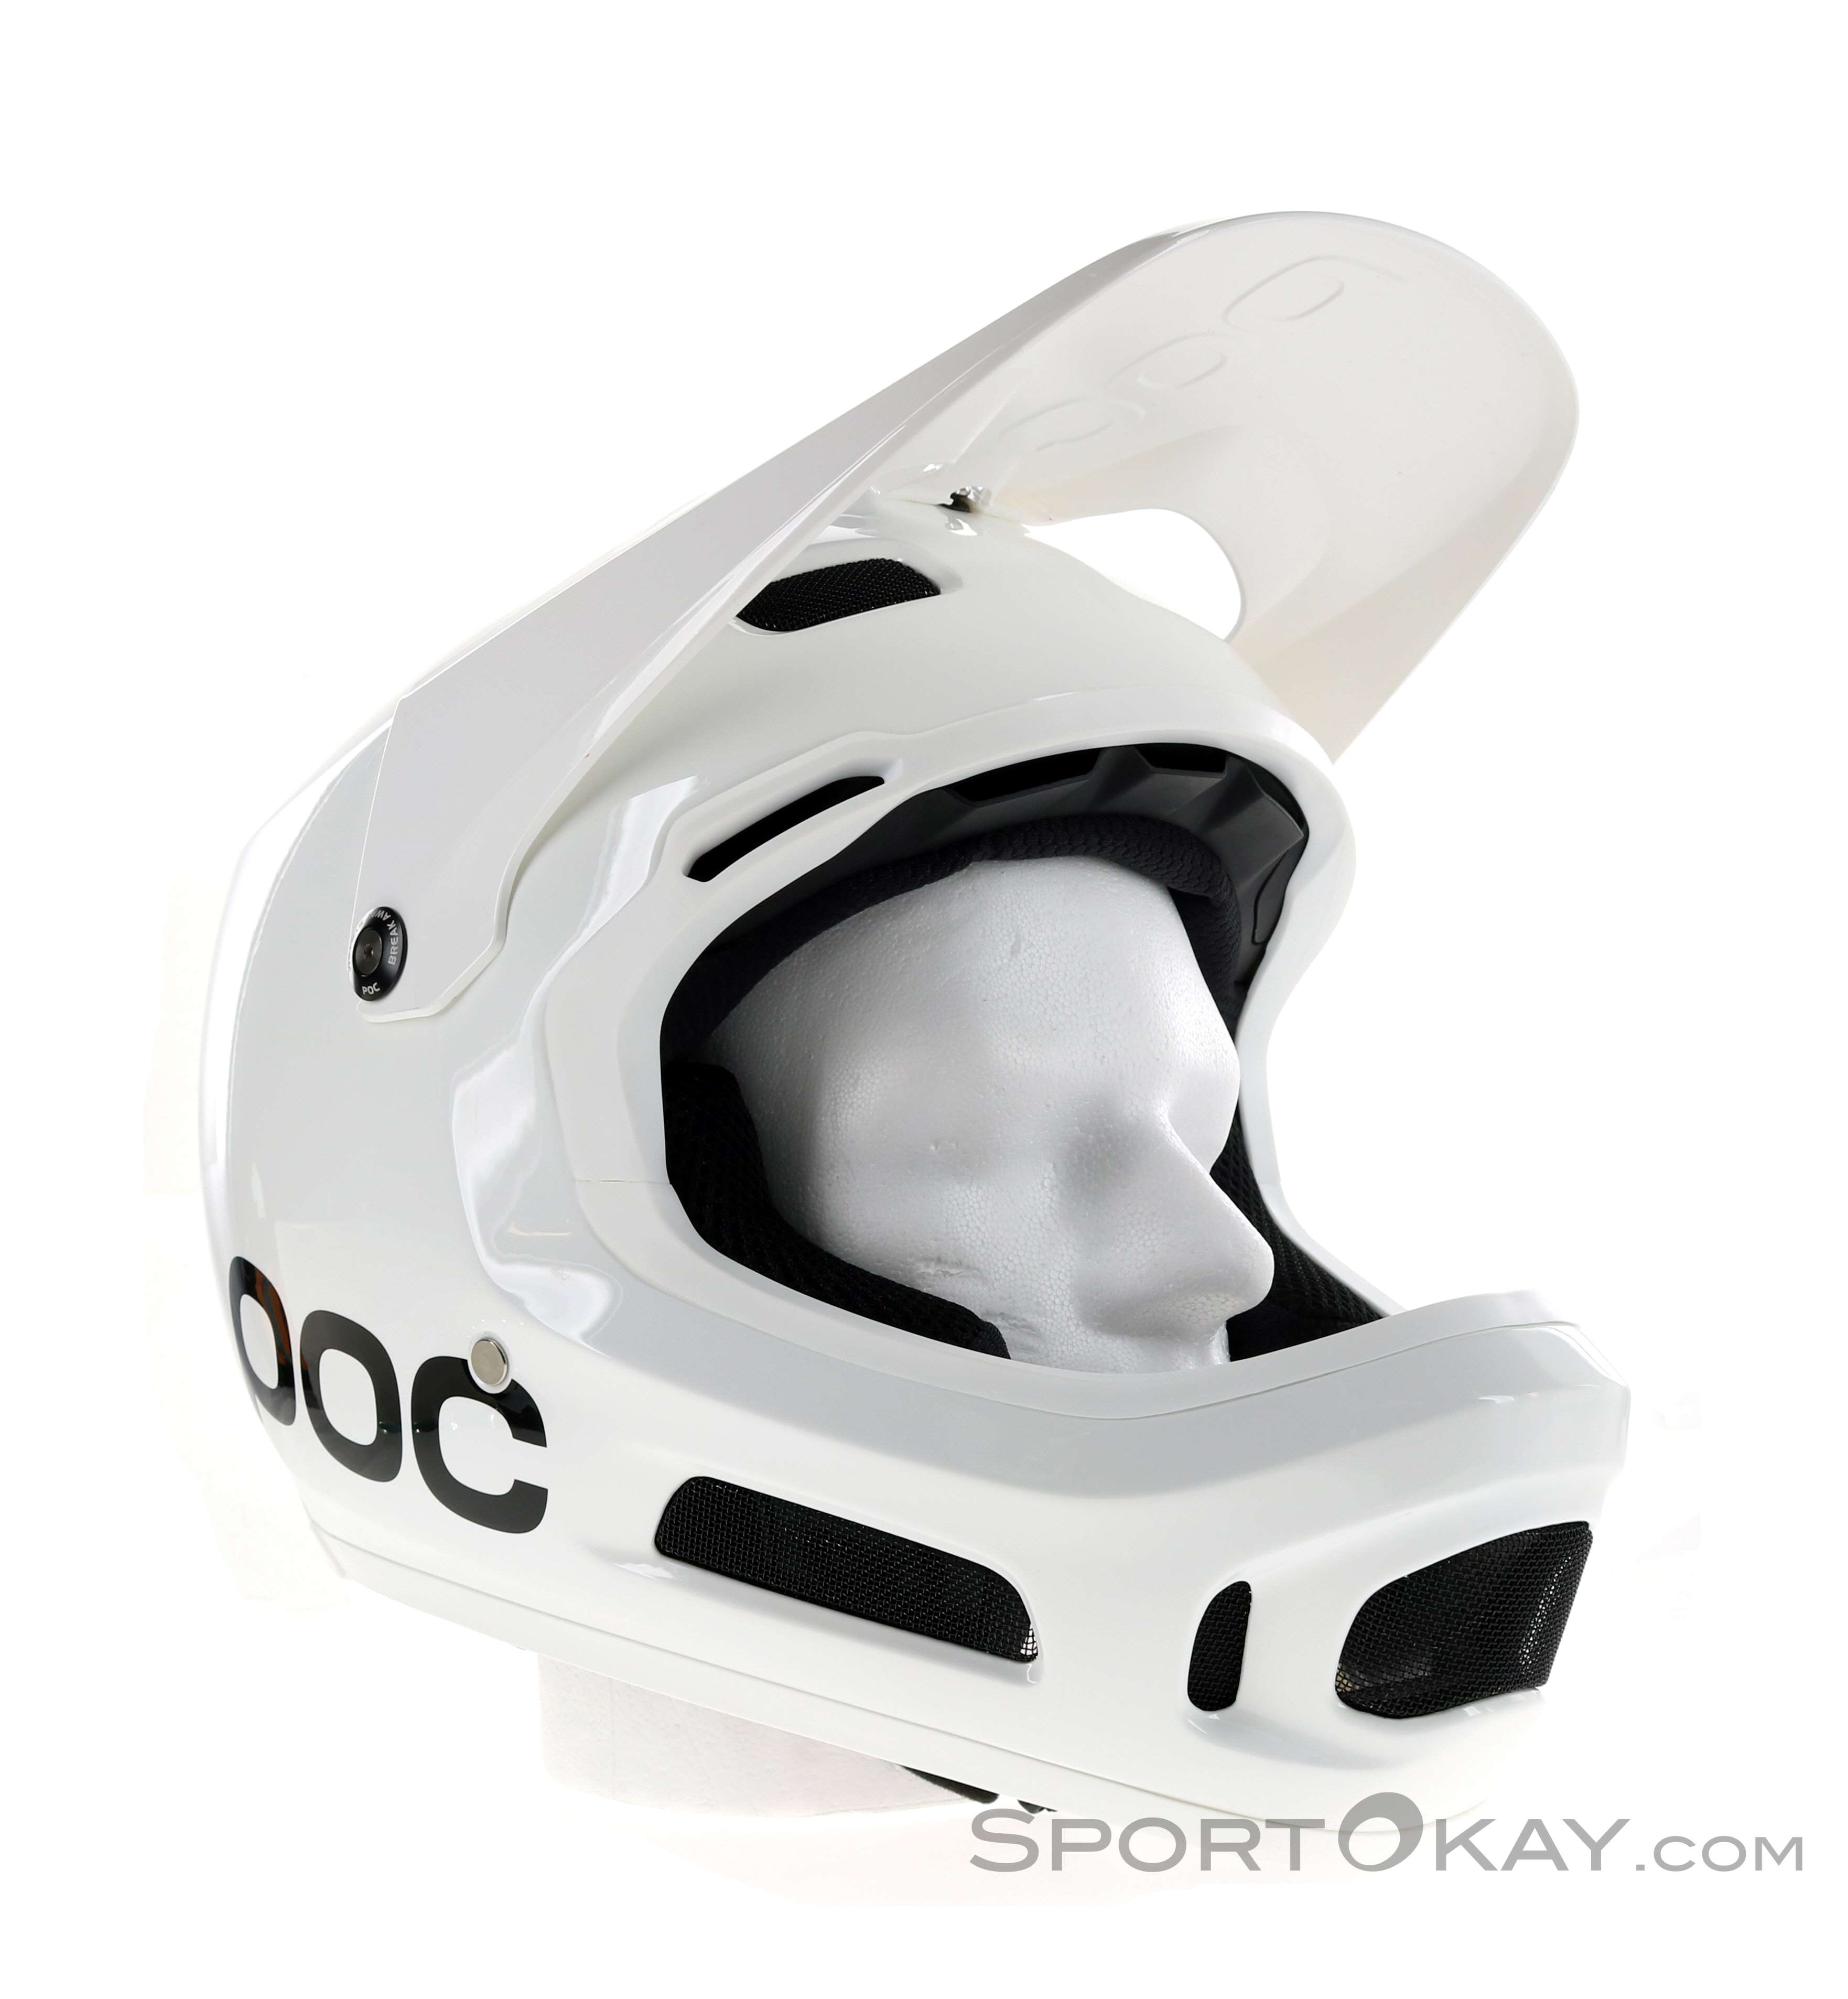 POC Coron Air Spin XS-S Hydrogen White Helmet for Downhill Mountain Biking